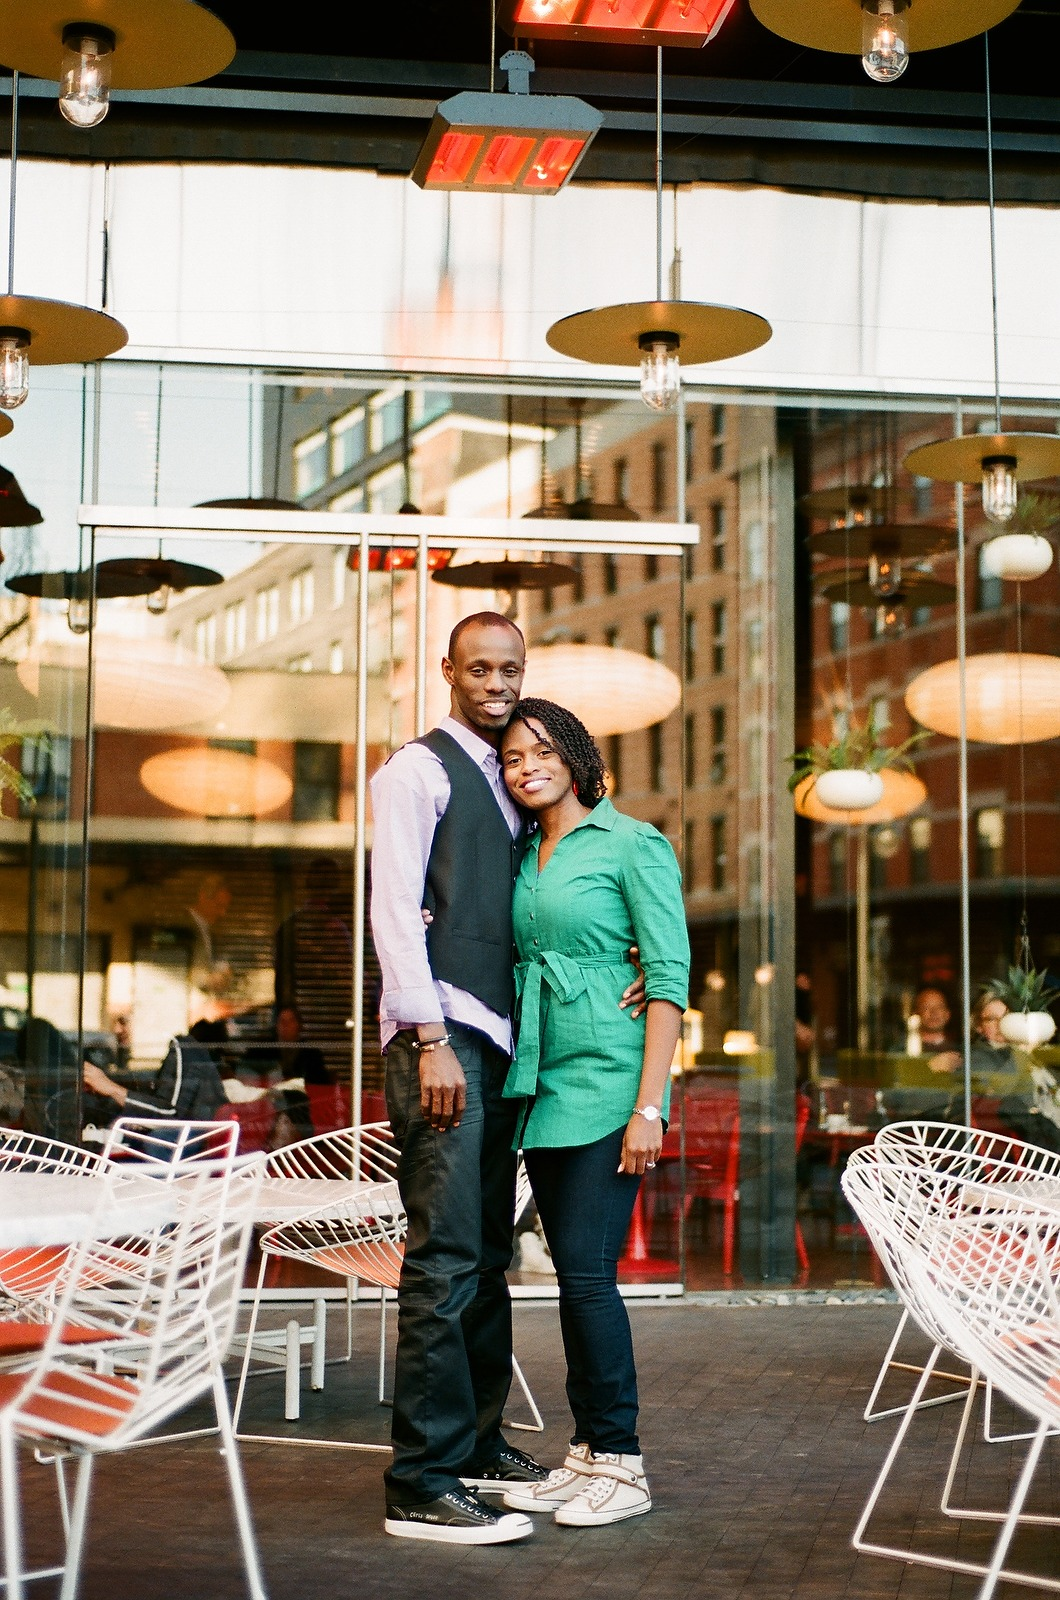 couple standing outside restaurant hugging in front of restaurant